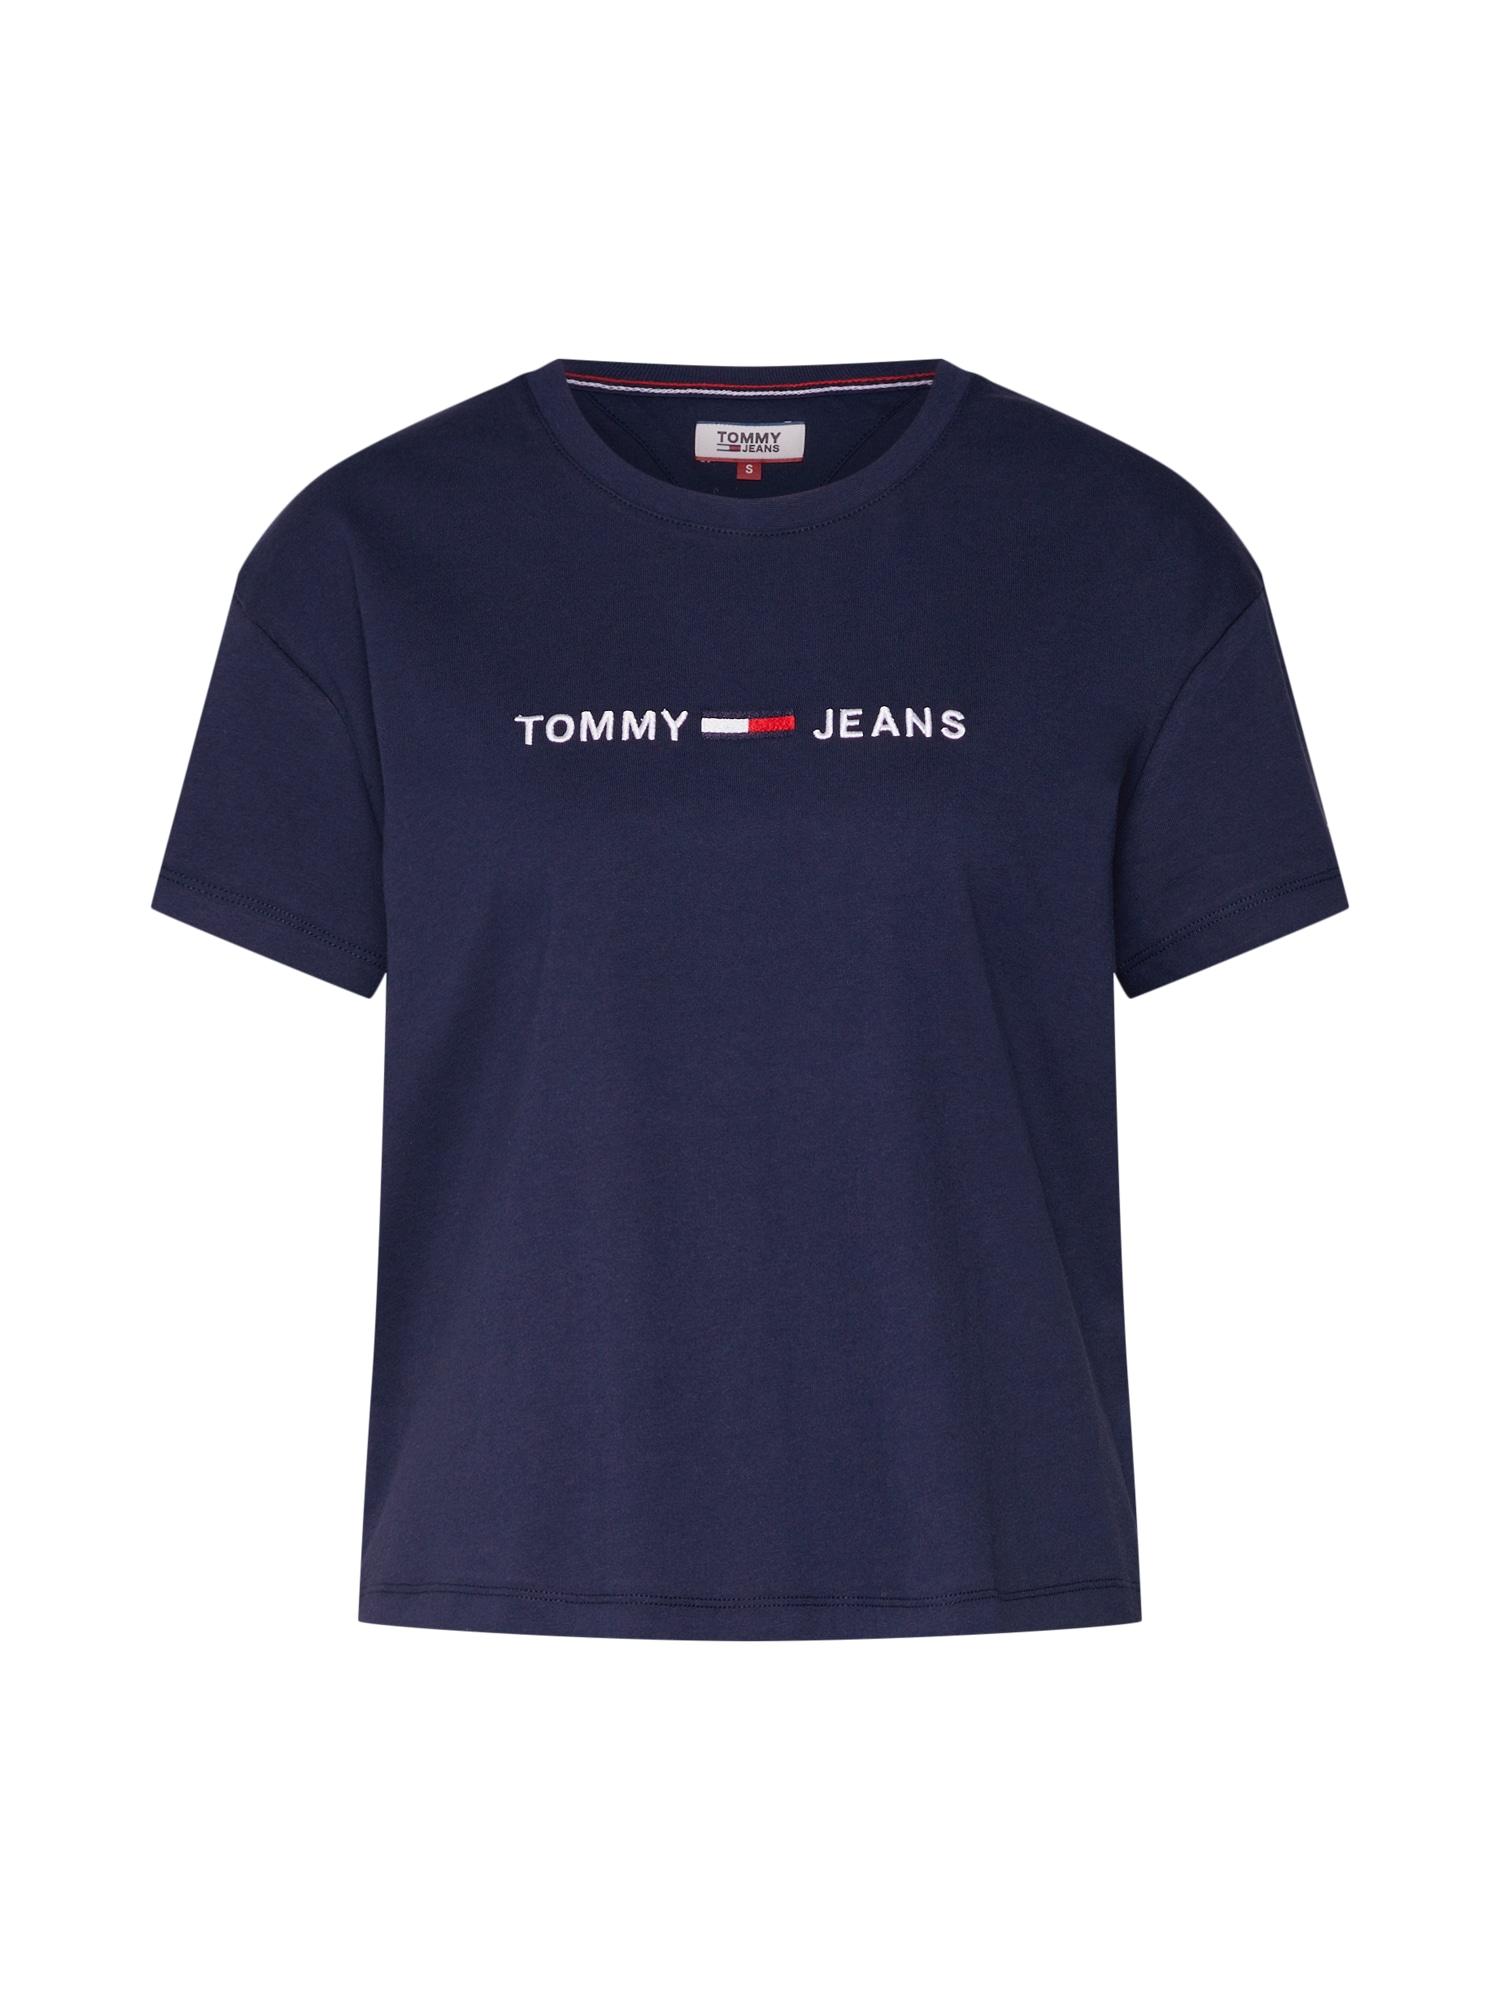 Tričko TJW CLEAN LINEAR LOGO TEE námořnická modř bílá Tommy Jeans